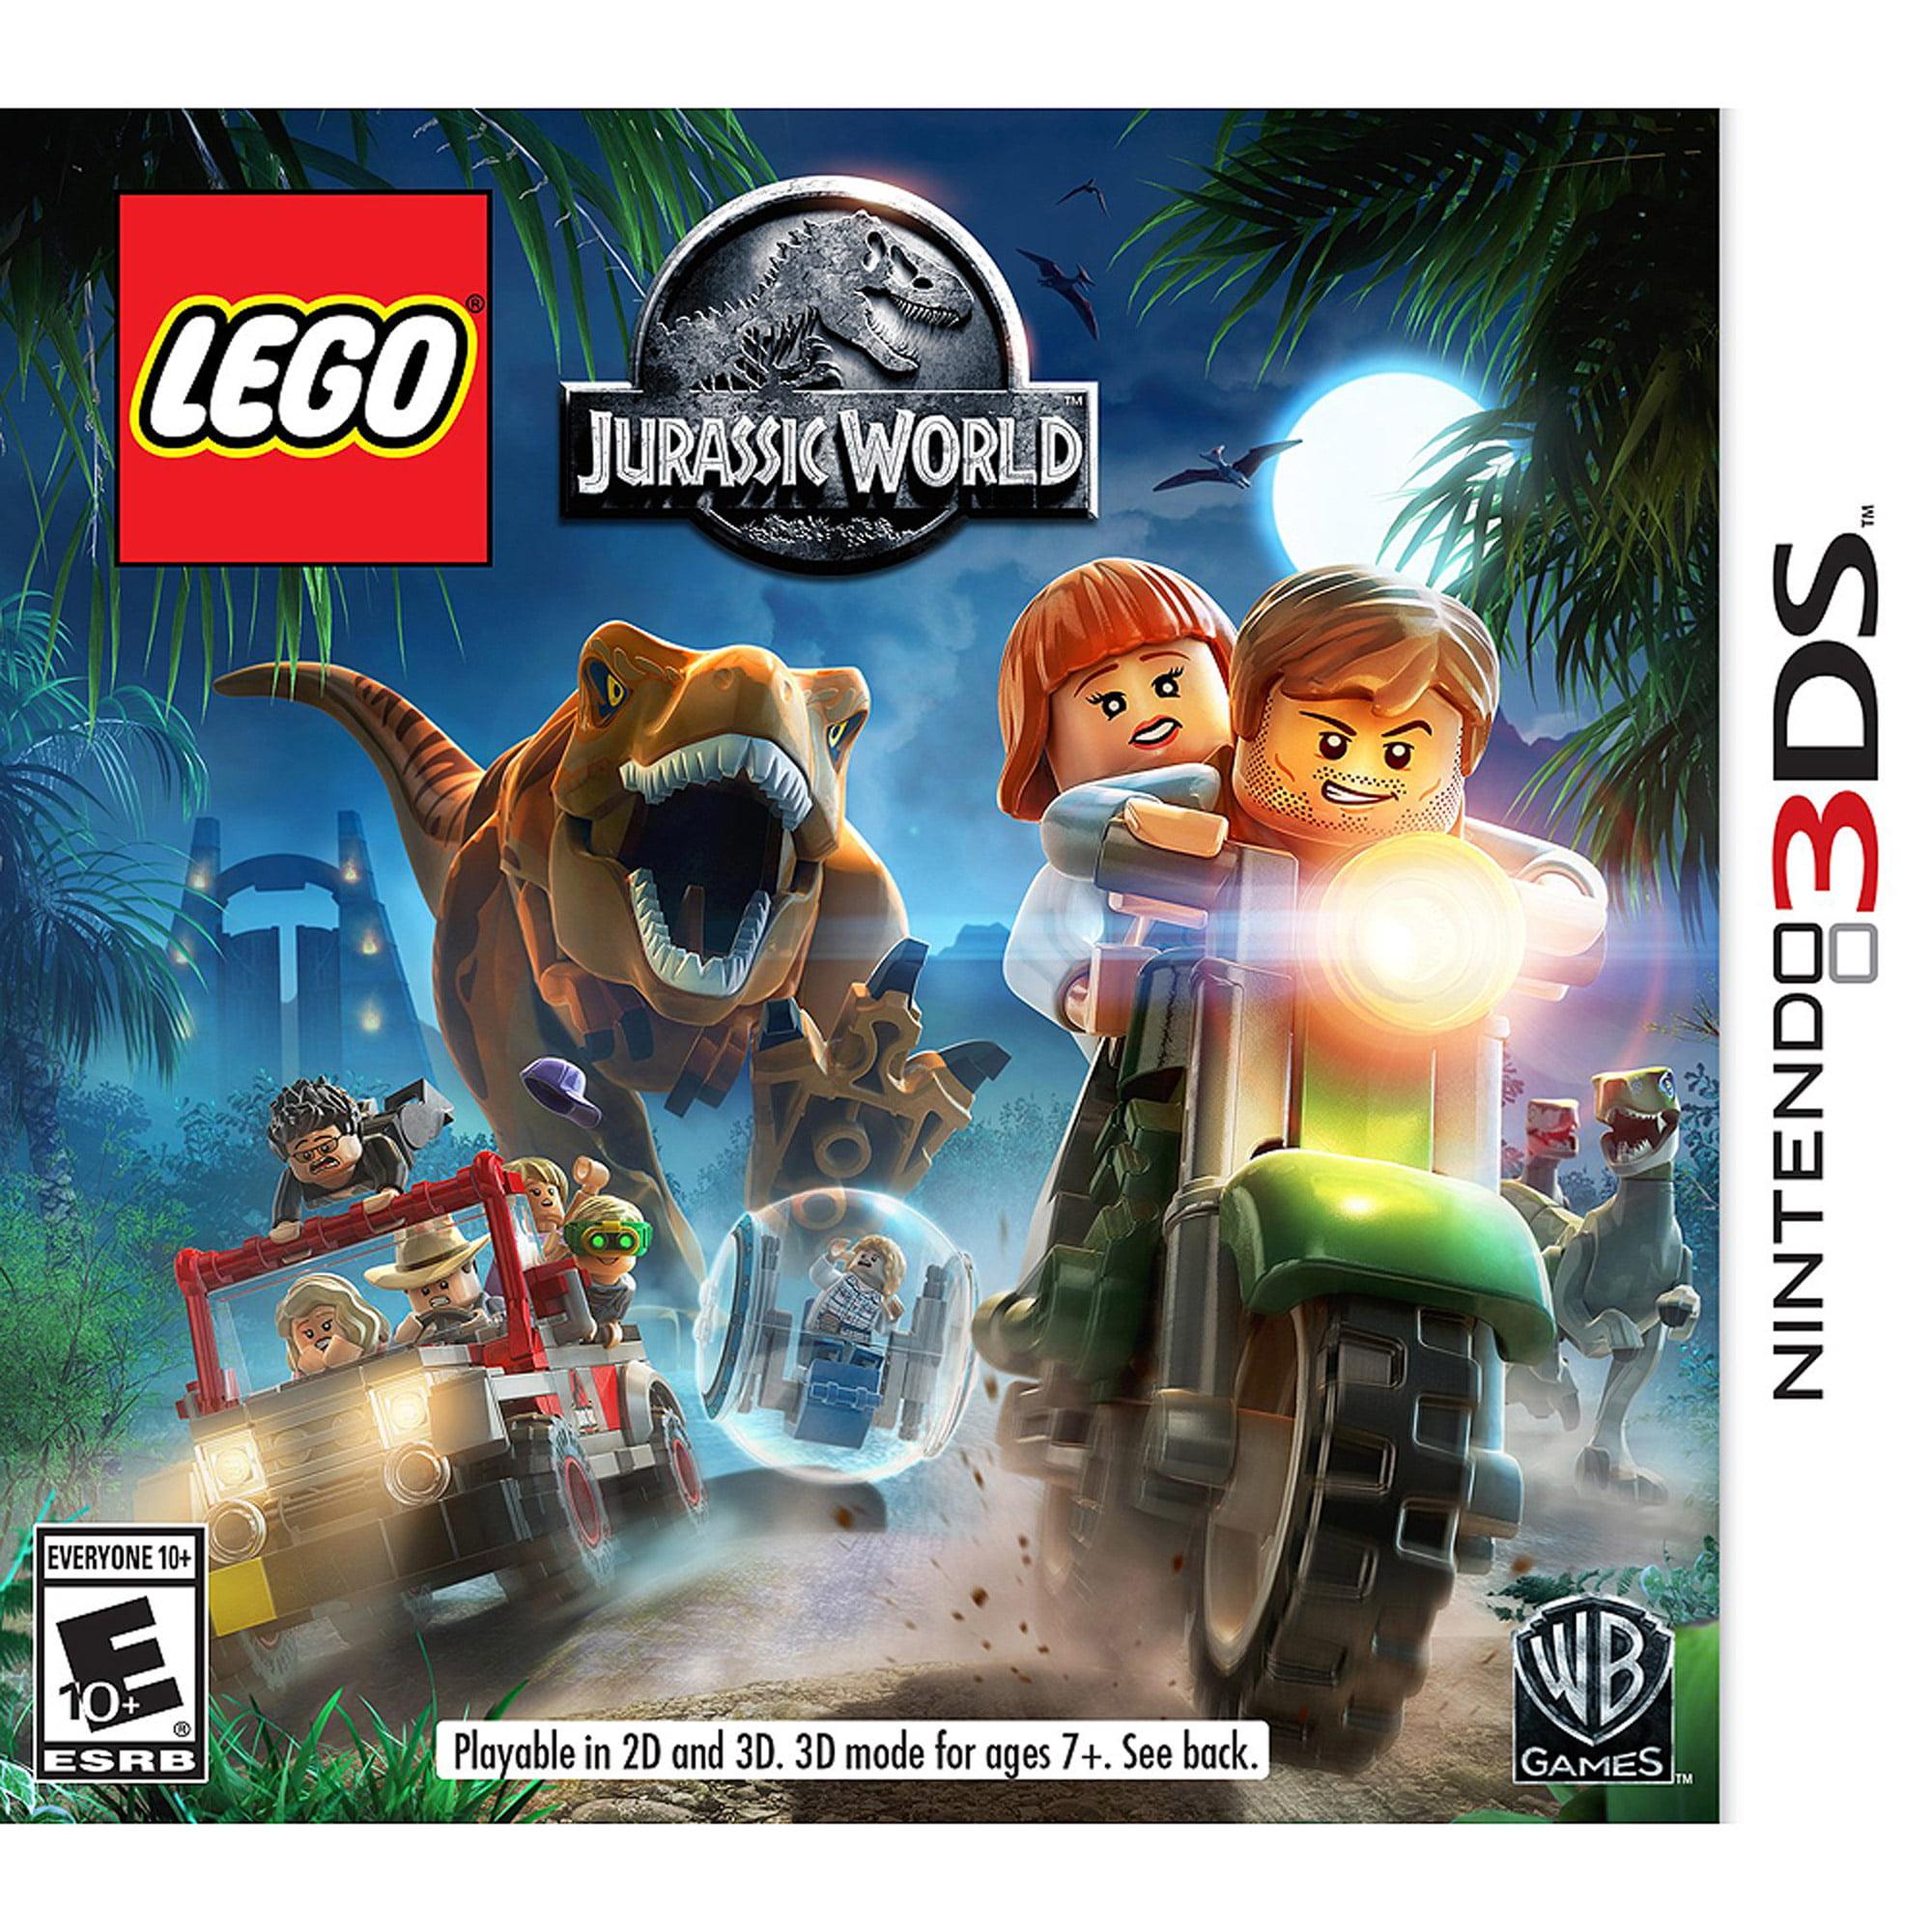 LEGO: Jurassic World (Nintendo 3DS)